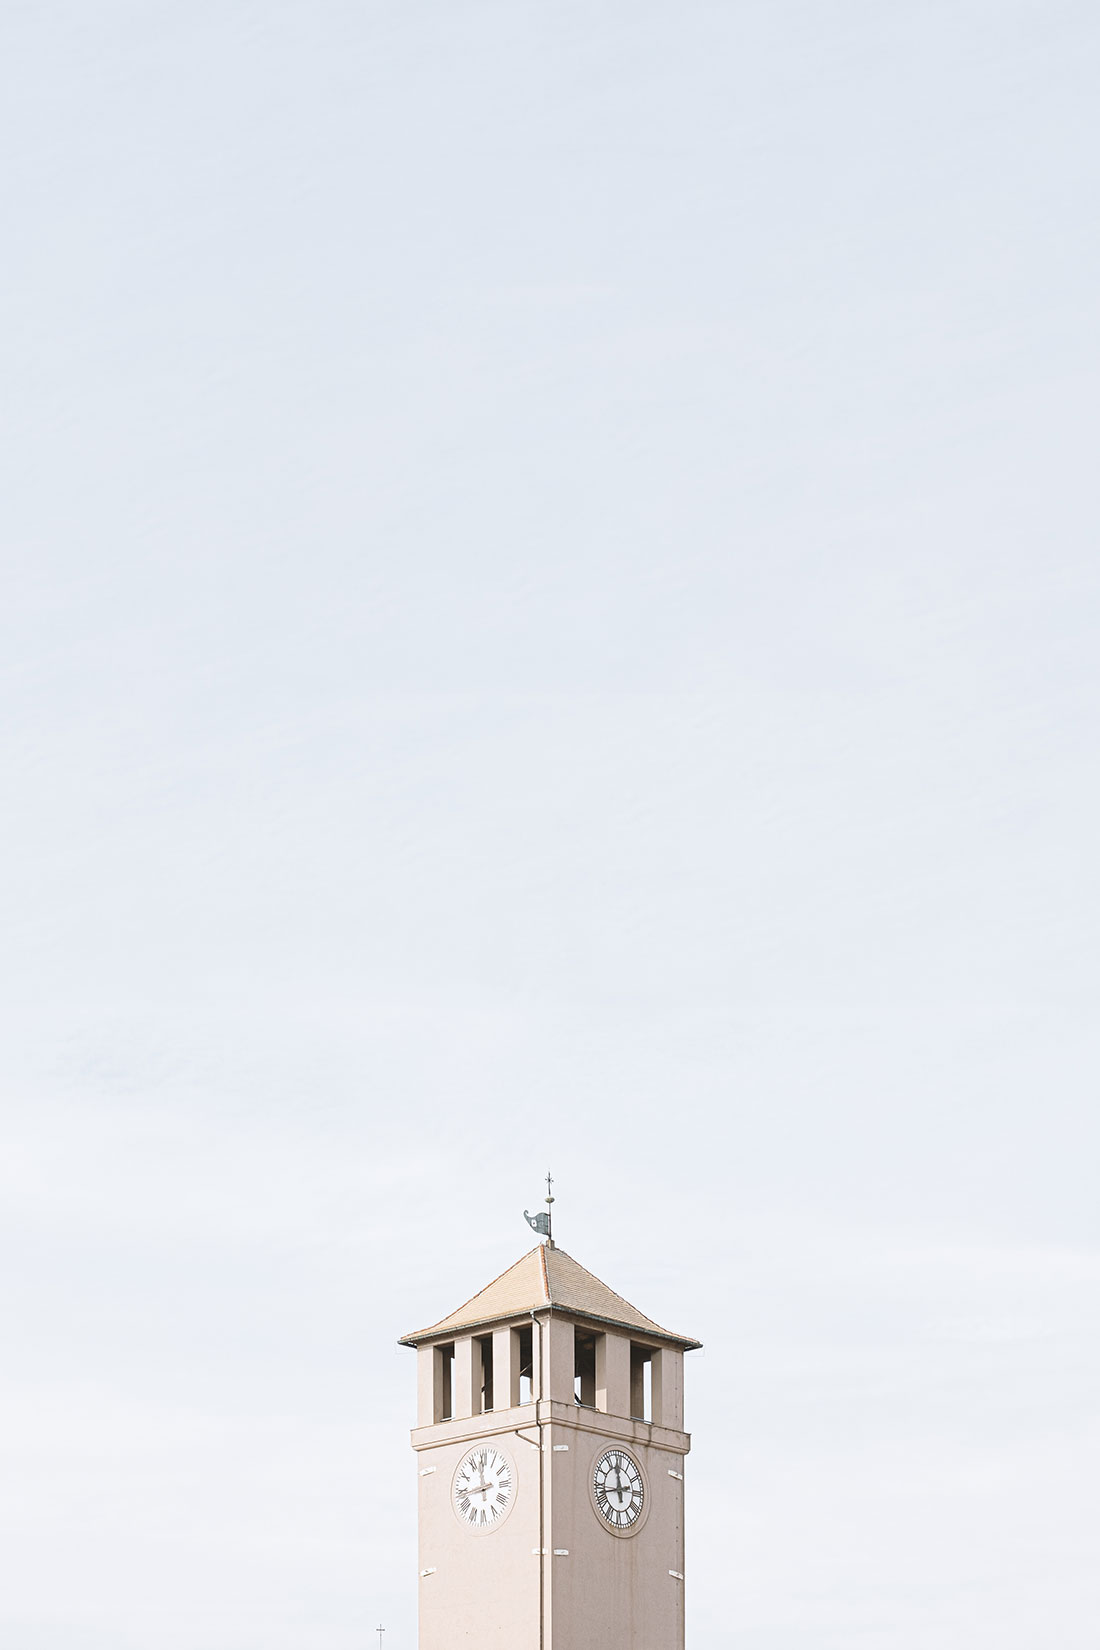 The Sky Above Savona - A Campanassa by Tiziano L. U. Caviglia